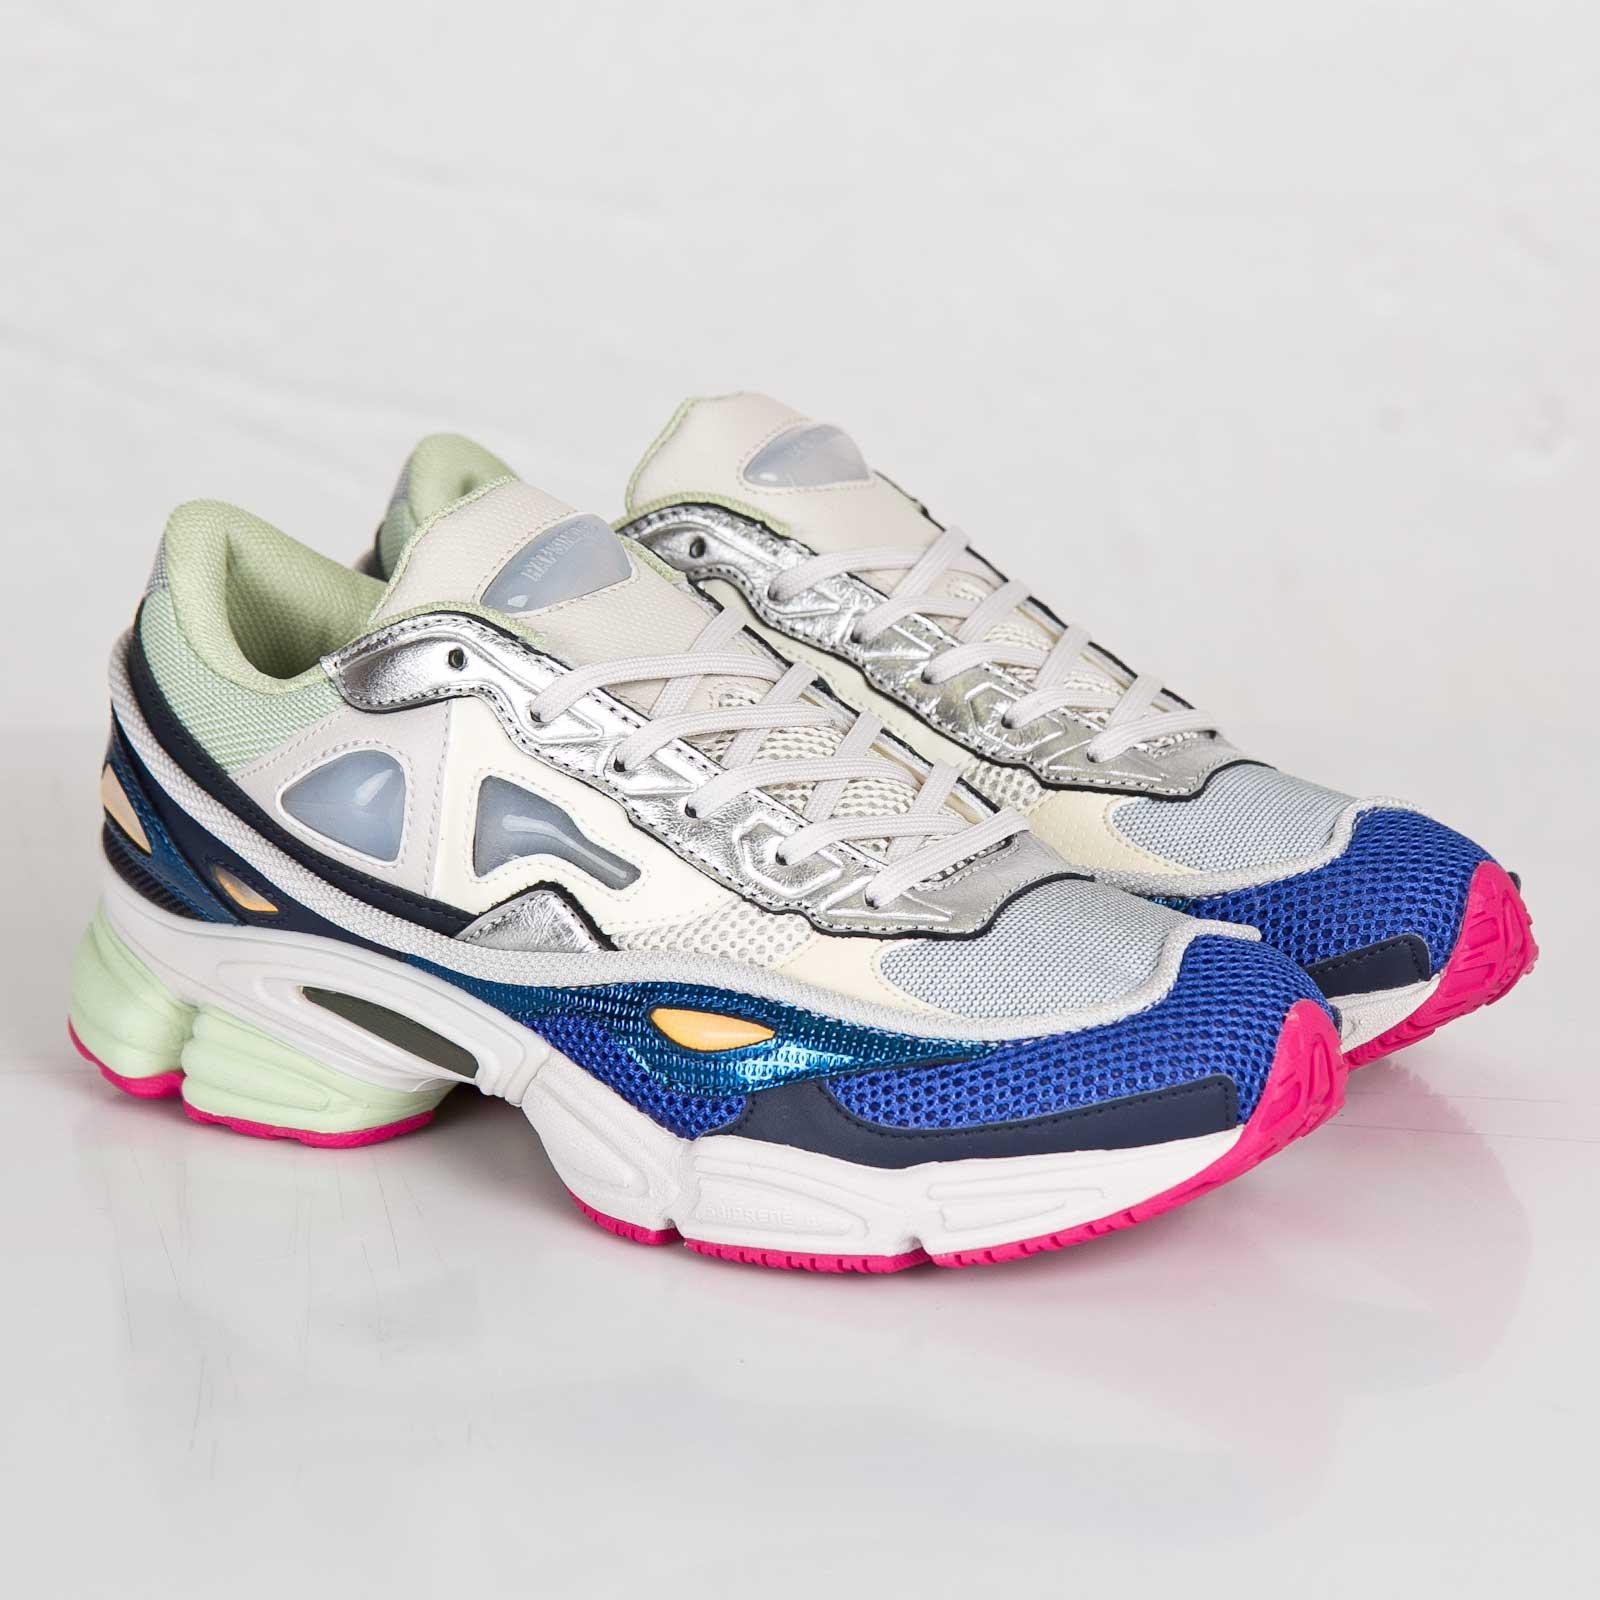 adidas Raf Simons Ozweego 2 - B26077 - Sneakersnstuff | sneakers